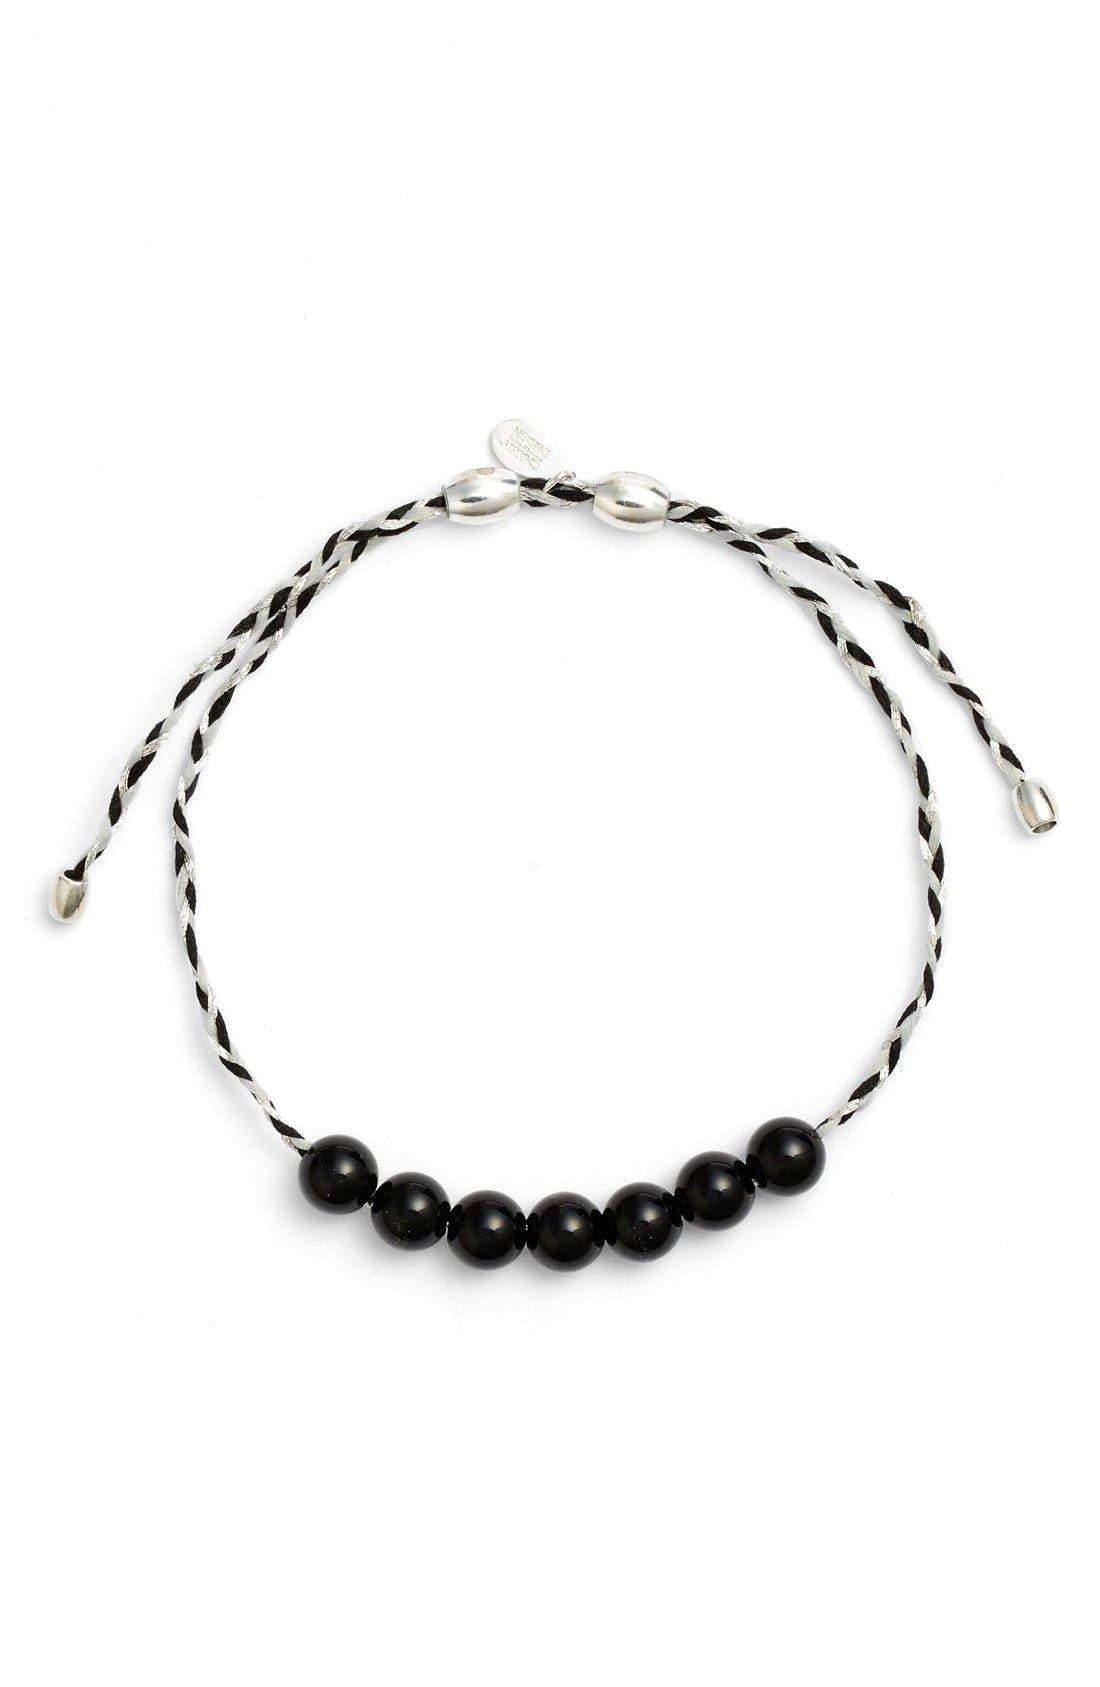 Main Image - Alex and Ani 'Earth Precious' Thread Bracelet